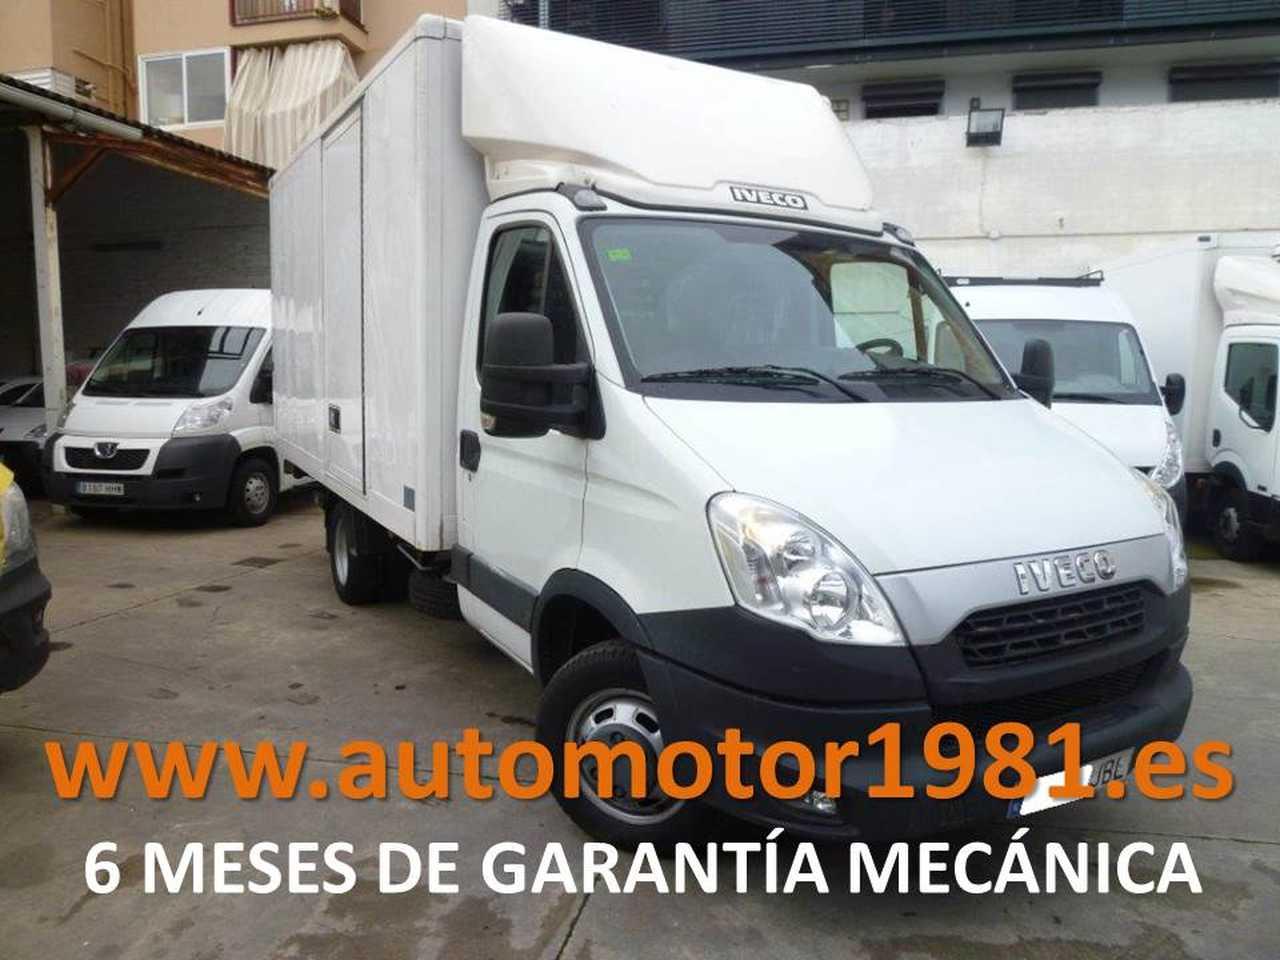 Iveco Daily 35C13 Furgon Puerta Elevadora - 6 MESES GARANTIA MECANICA  - Foto 1